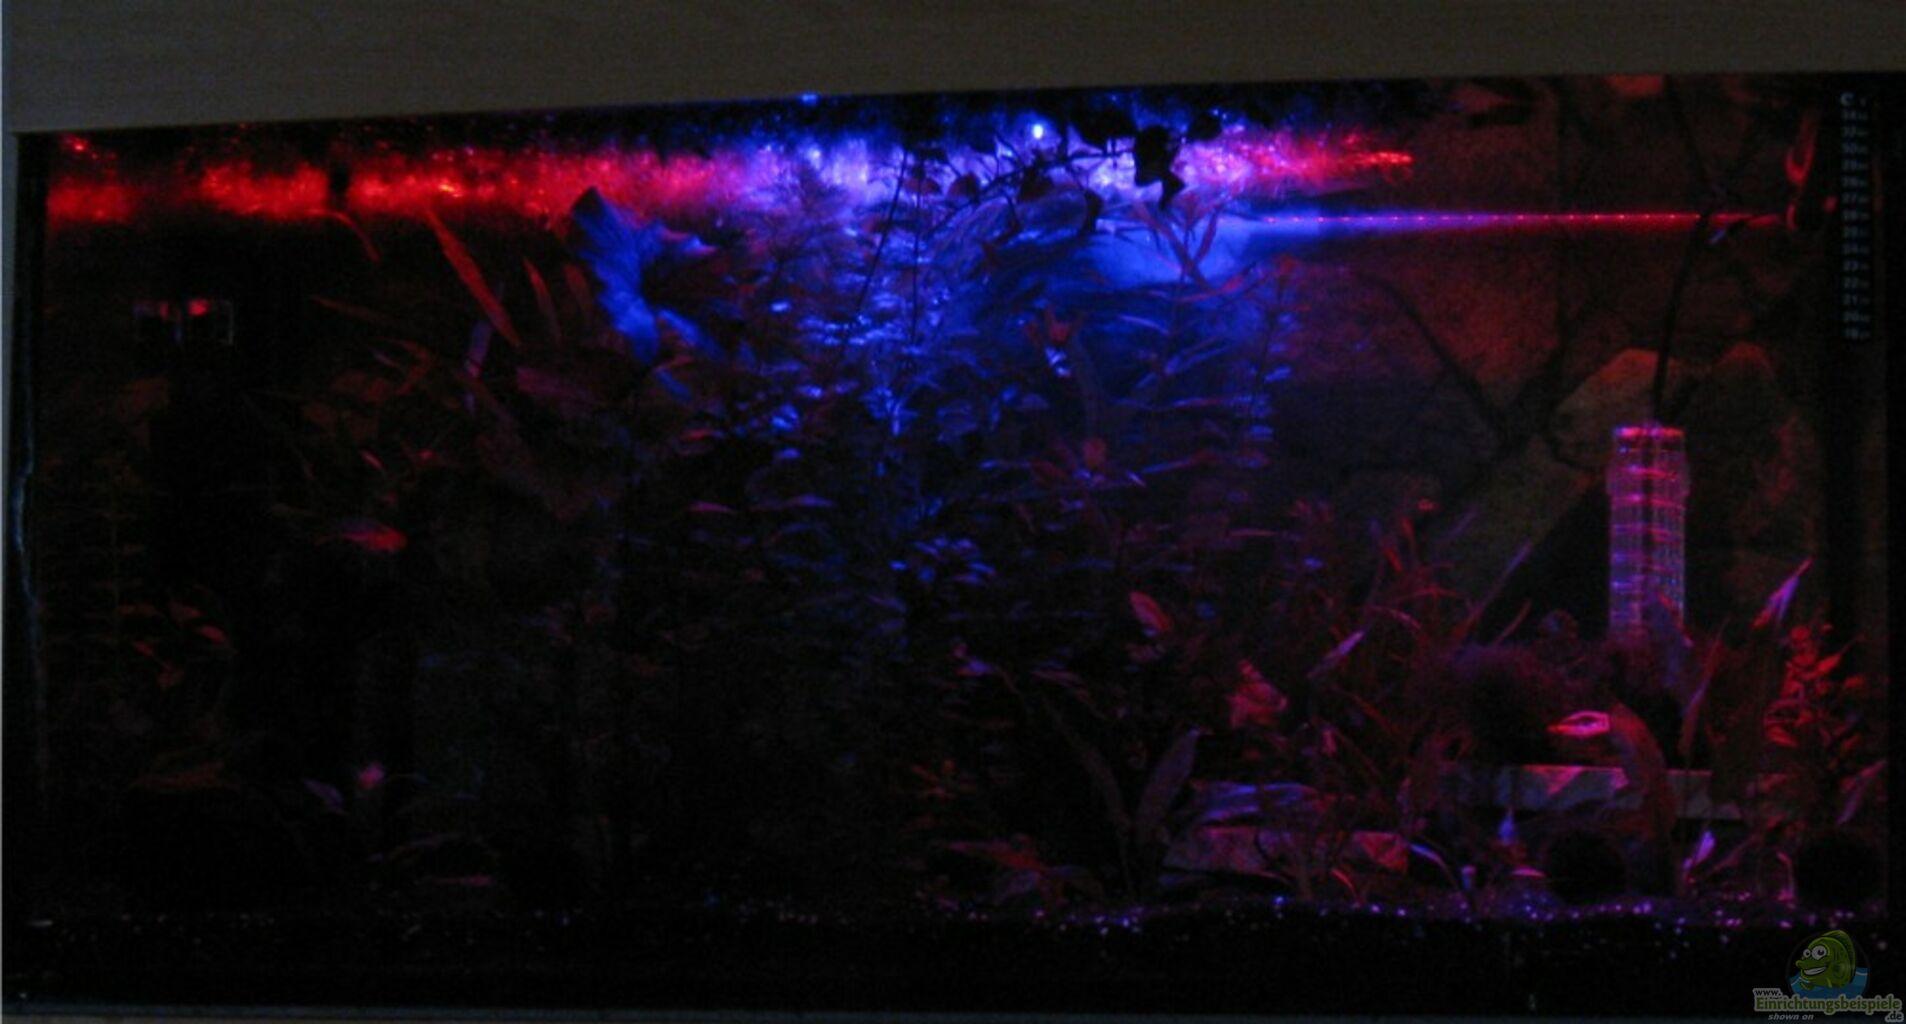 Durchlauferhitzer durchlauferhitzer aquarium for Aquarium heizen